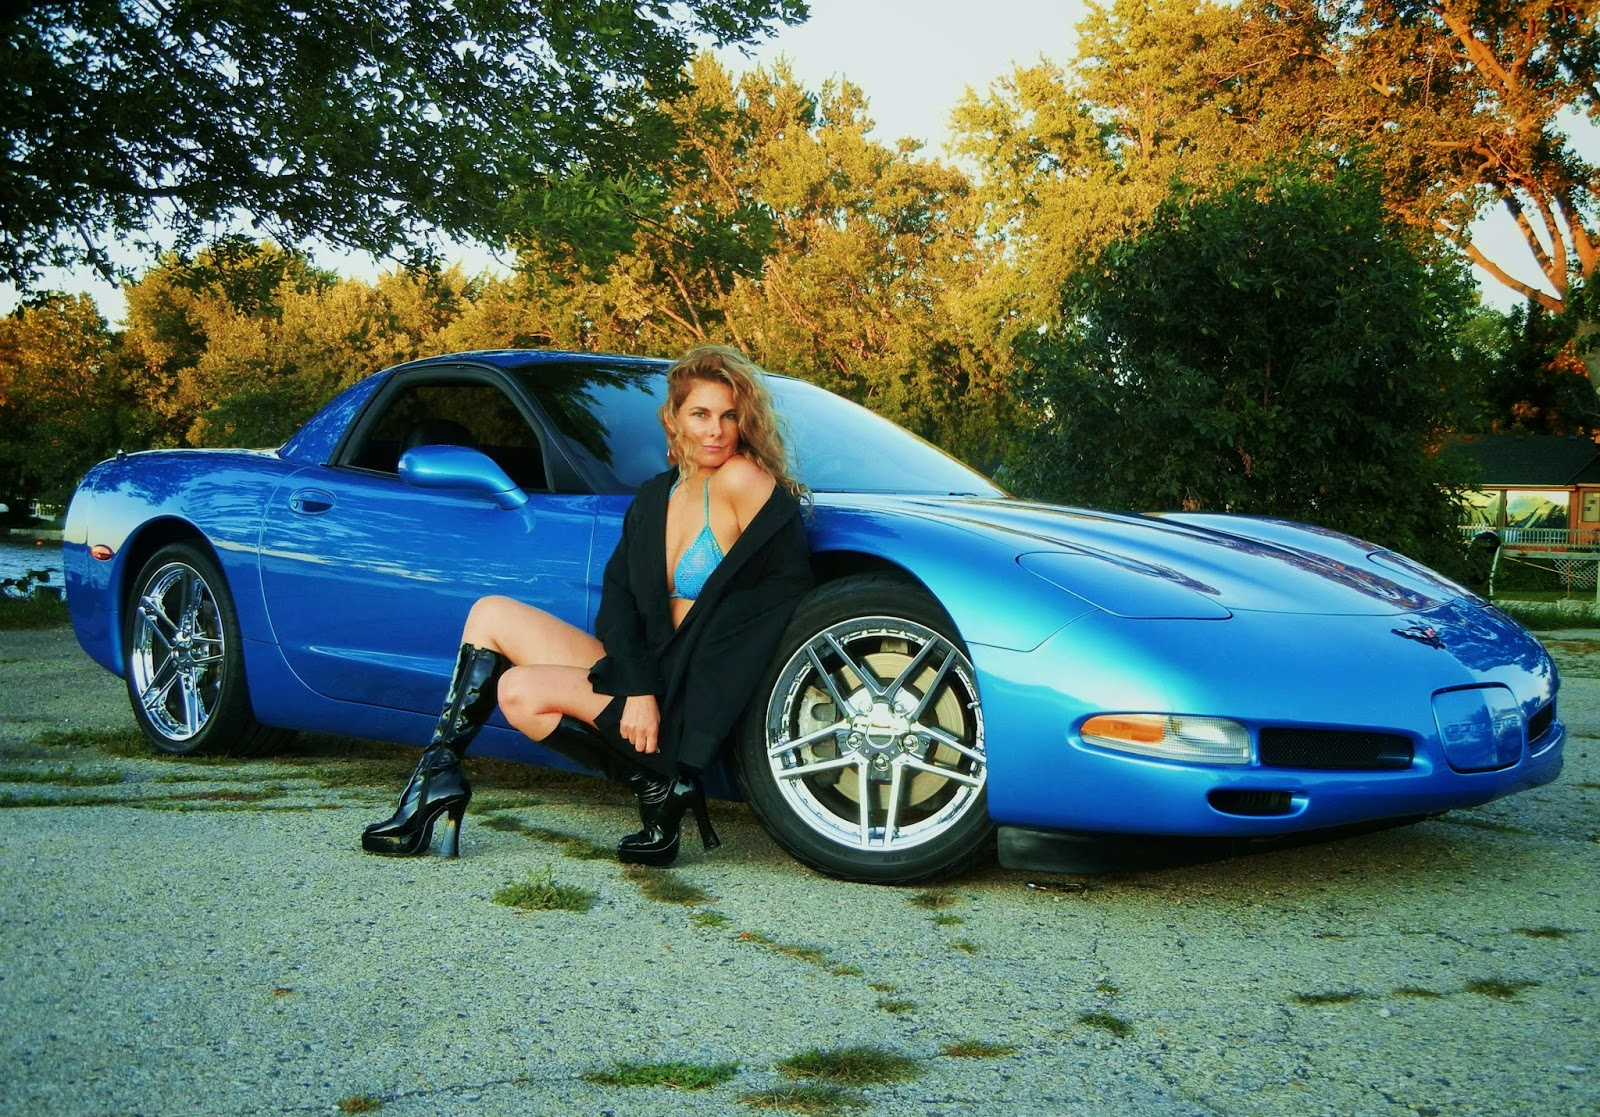 Cyndi thegentlemanracer com